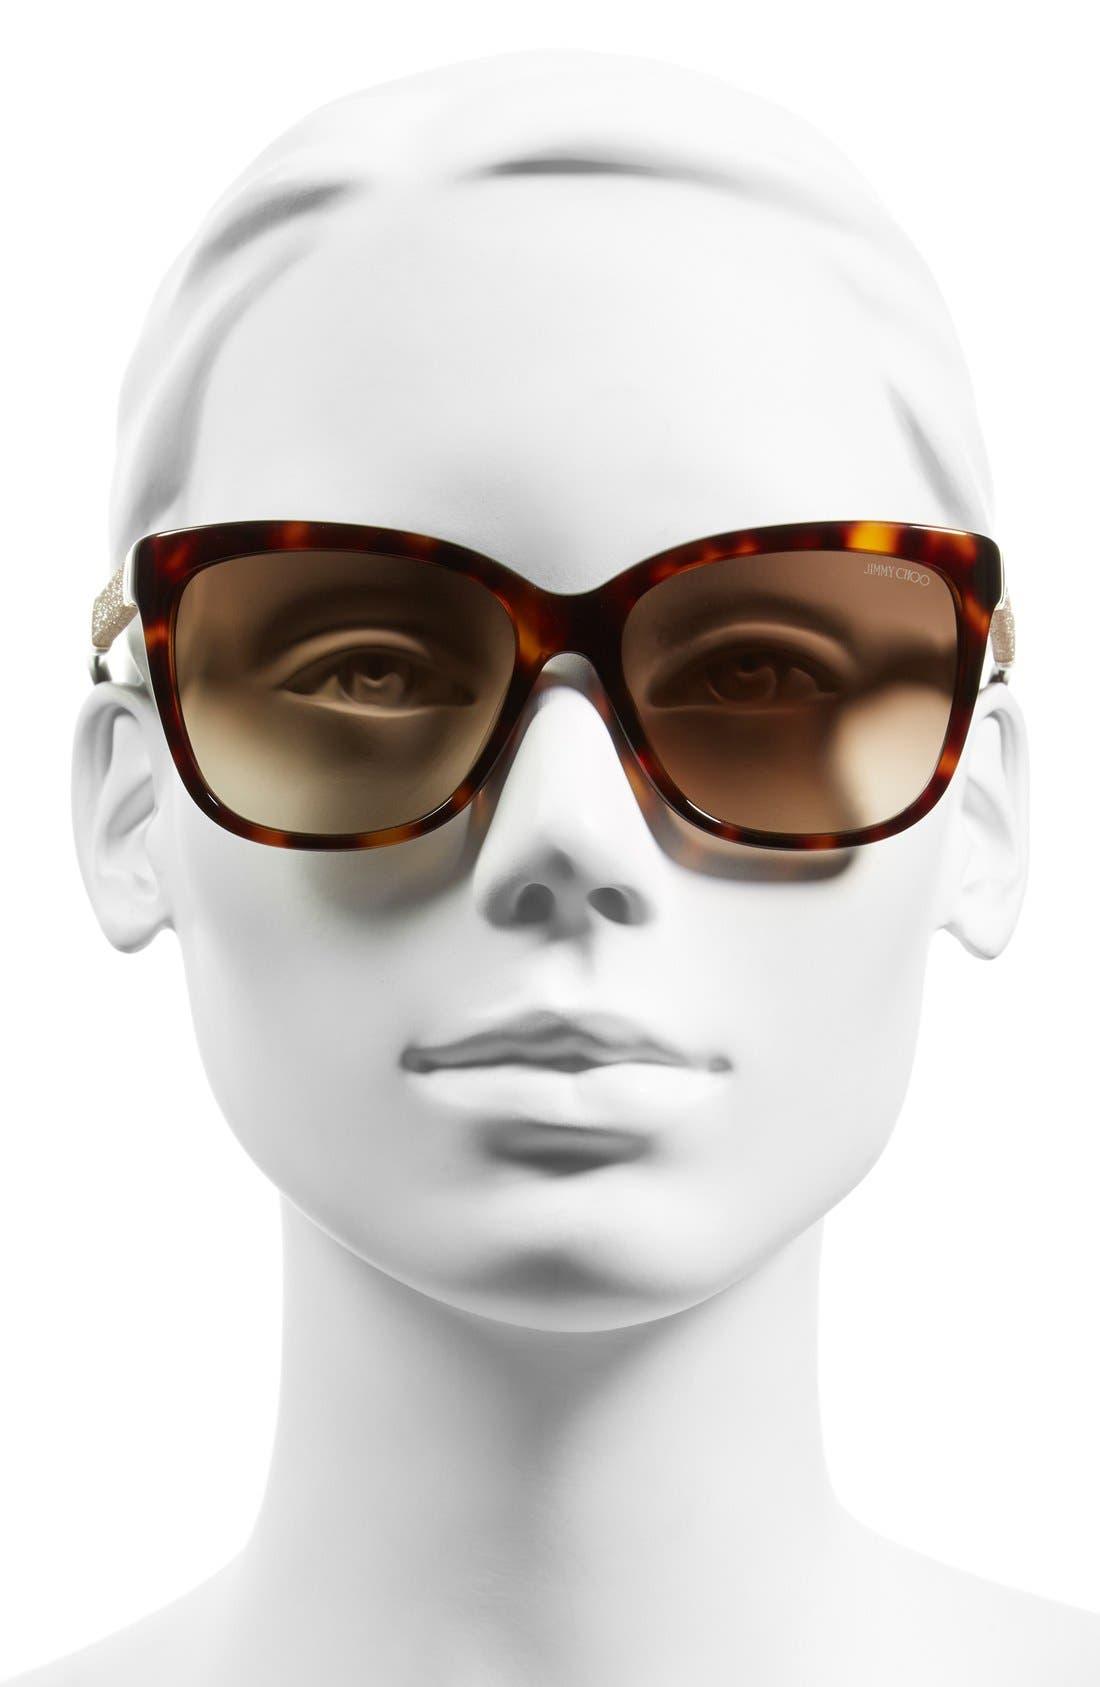 'Coras' 56mm Retro Sunglasses,                             Alternate thumbnail 2, color,                             200